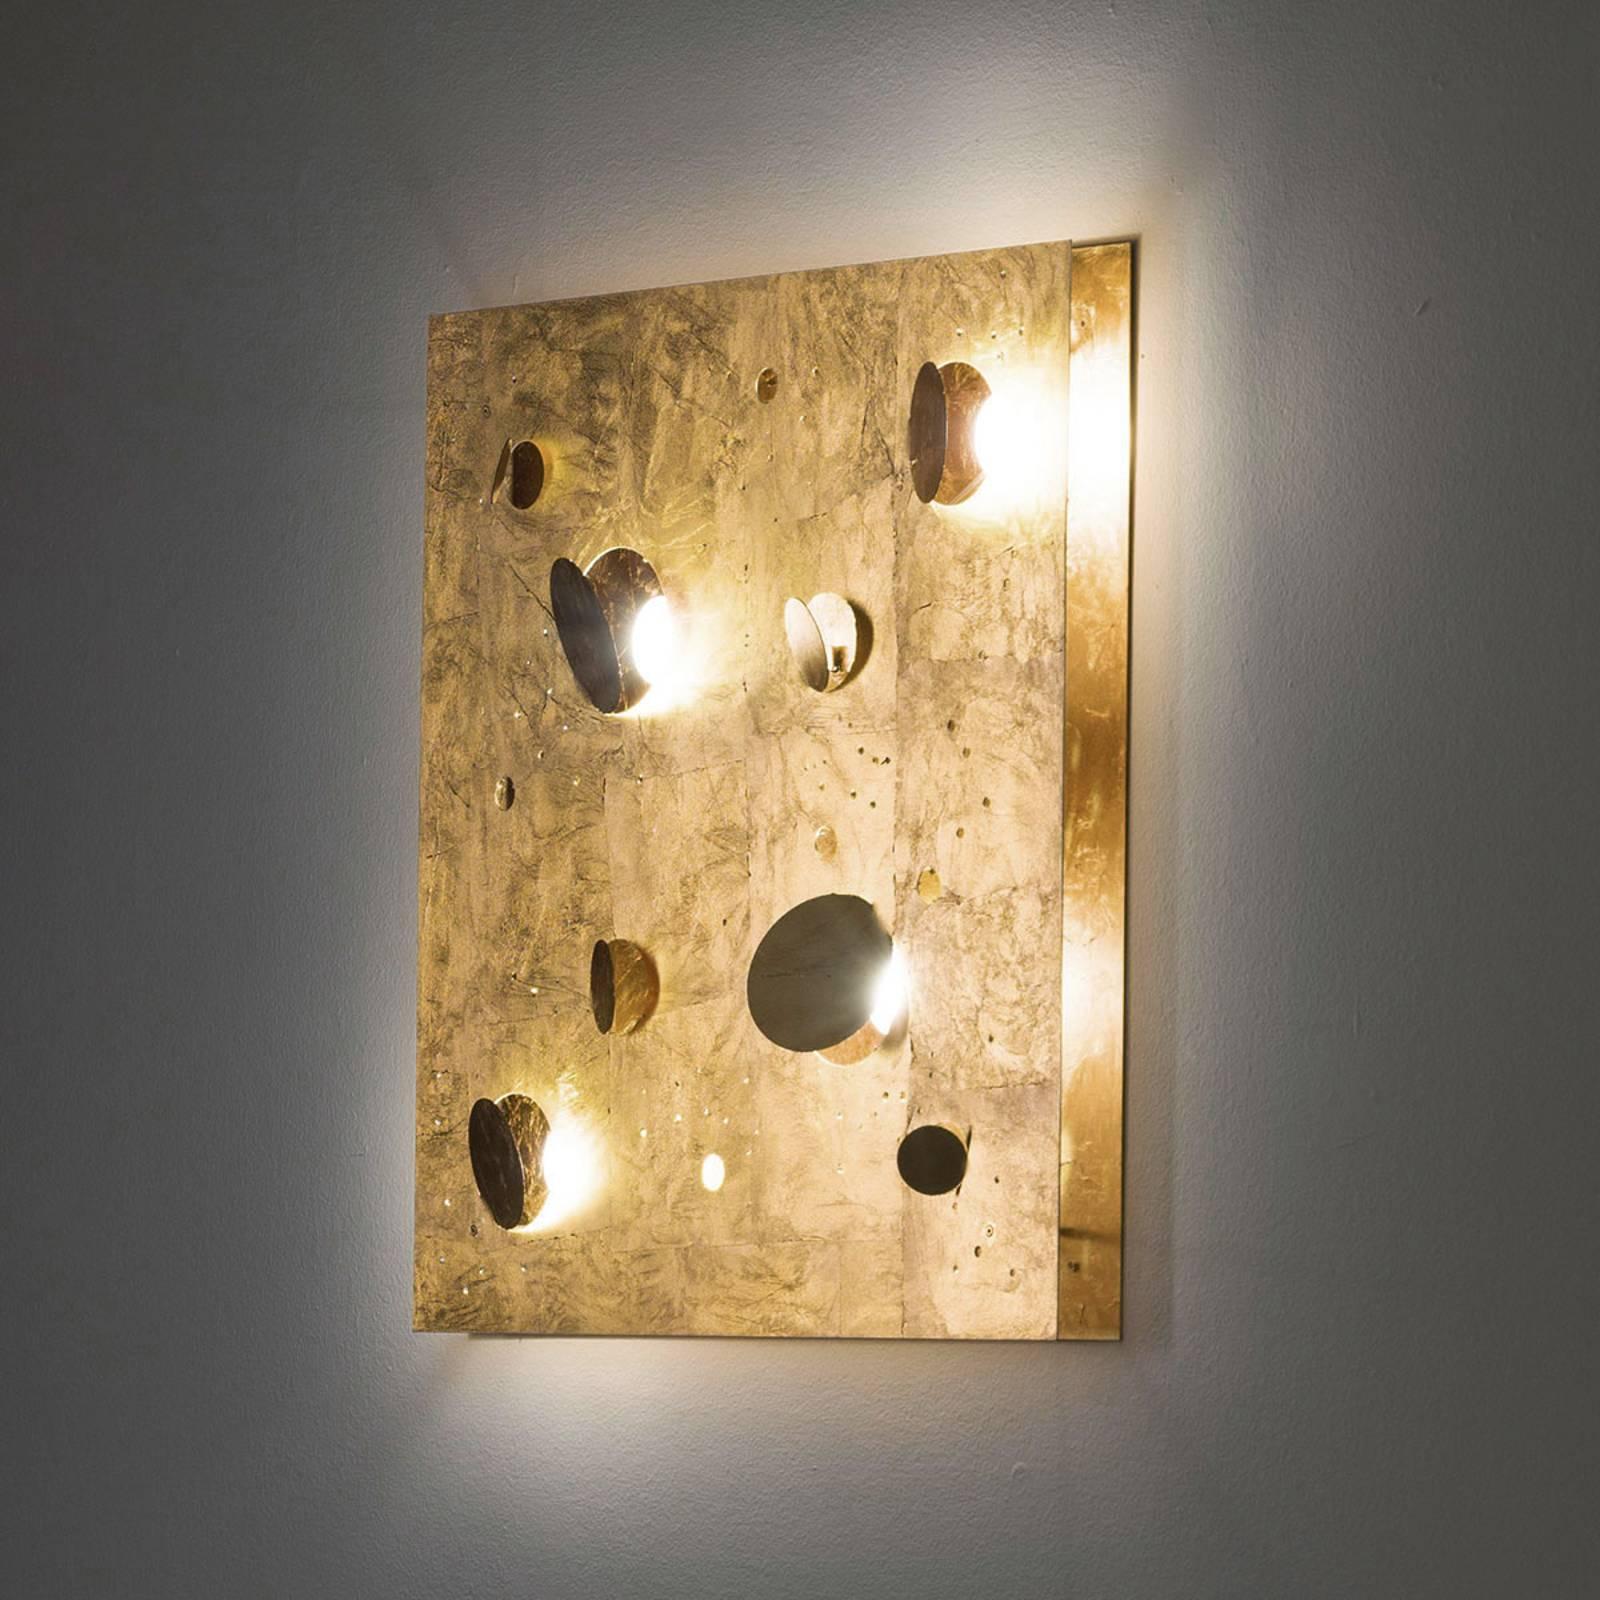 Knikerboker Buchi -seinälamppu 60x60cm lehtikulta